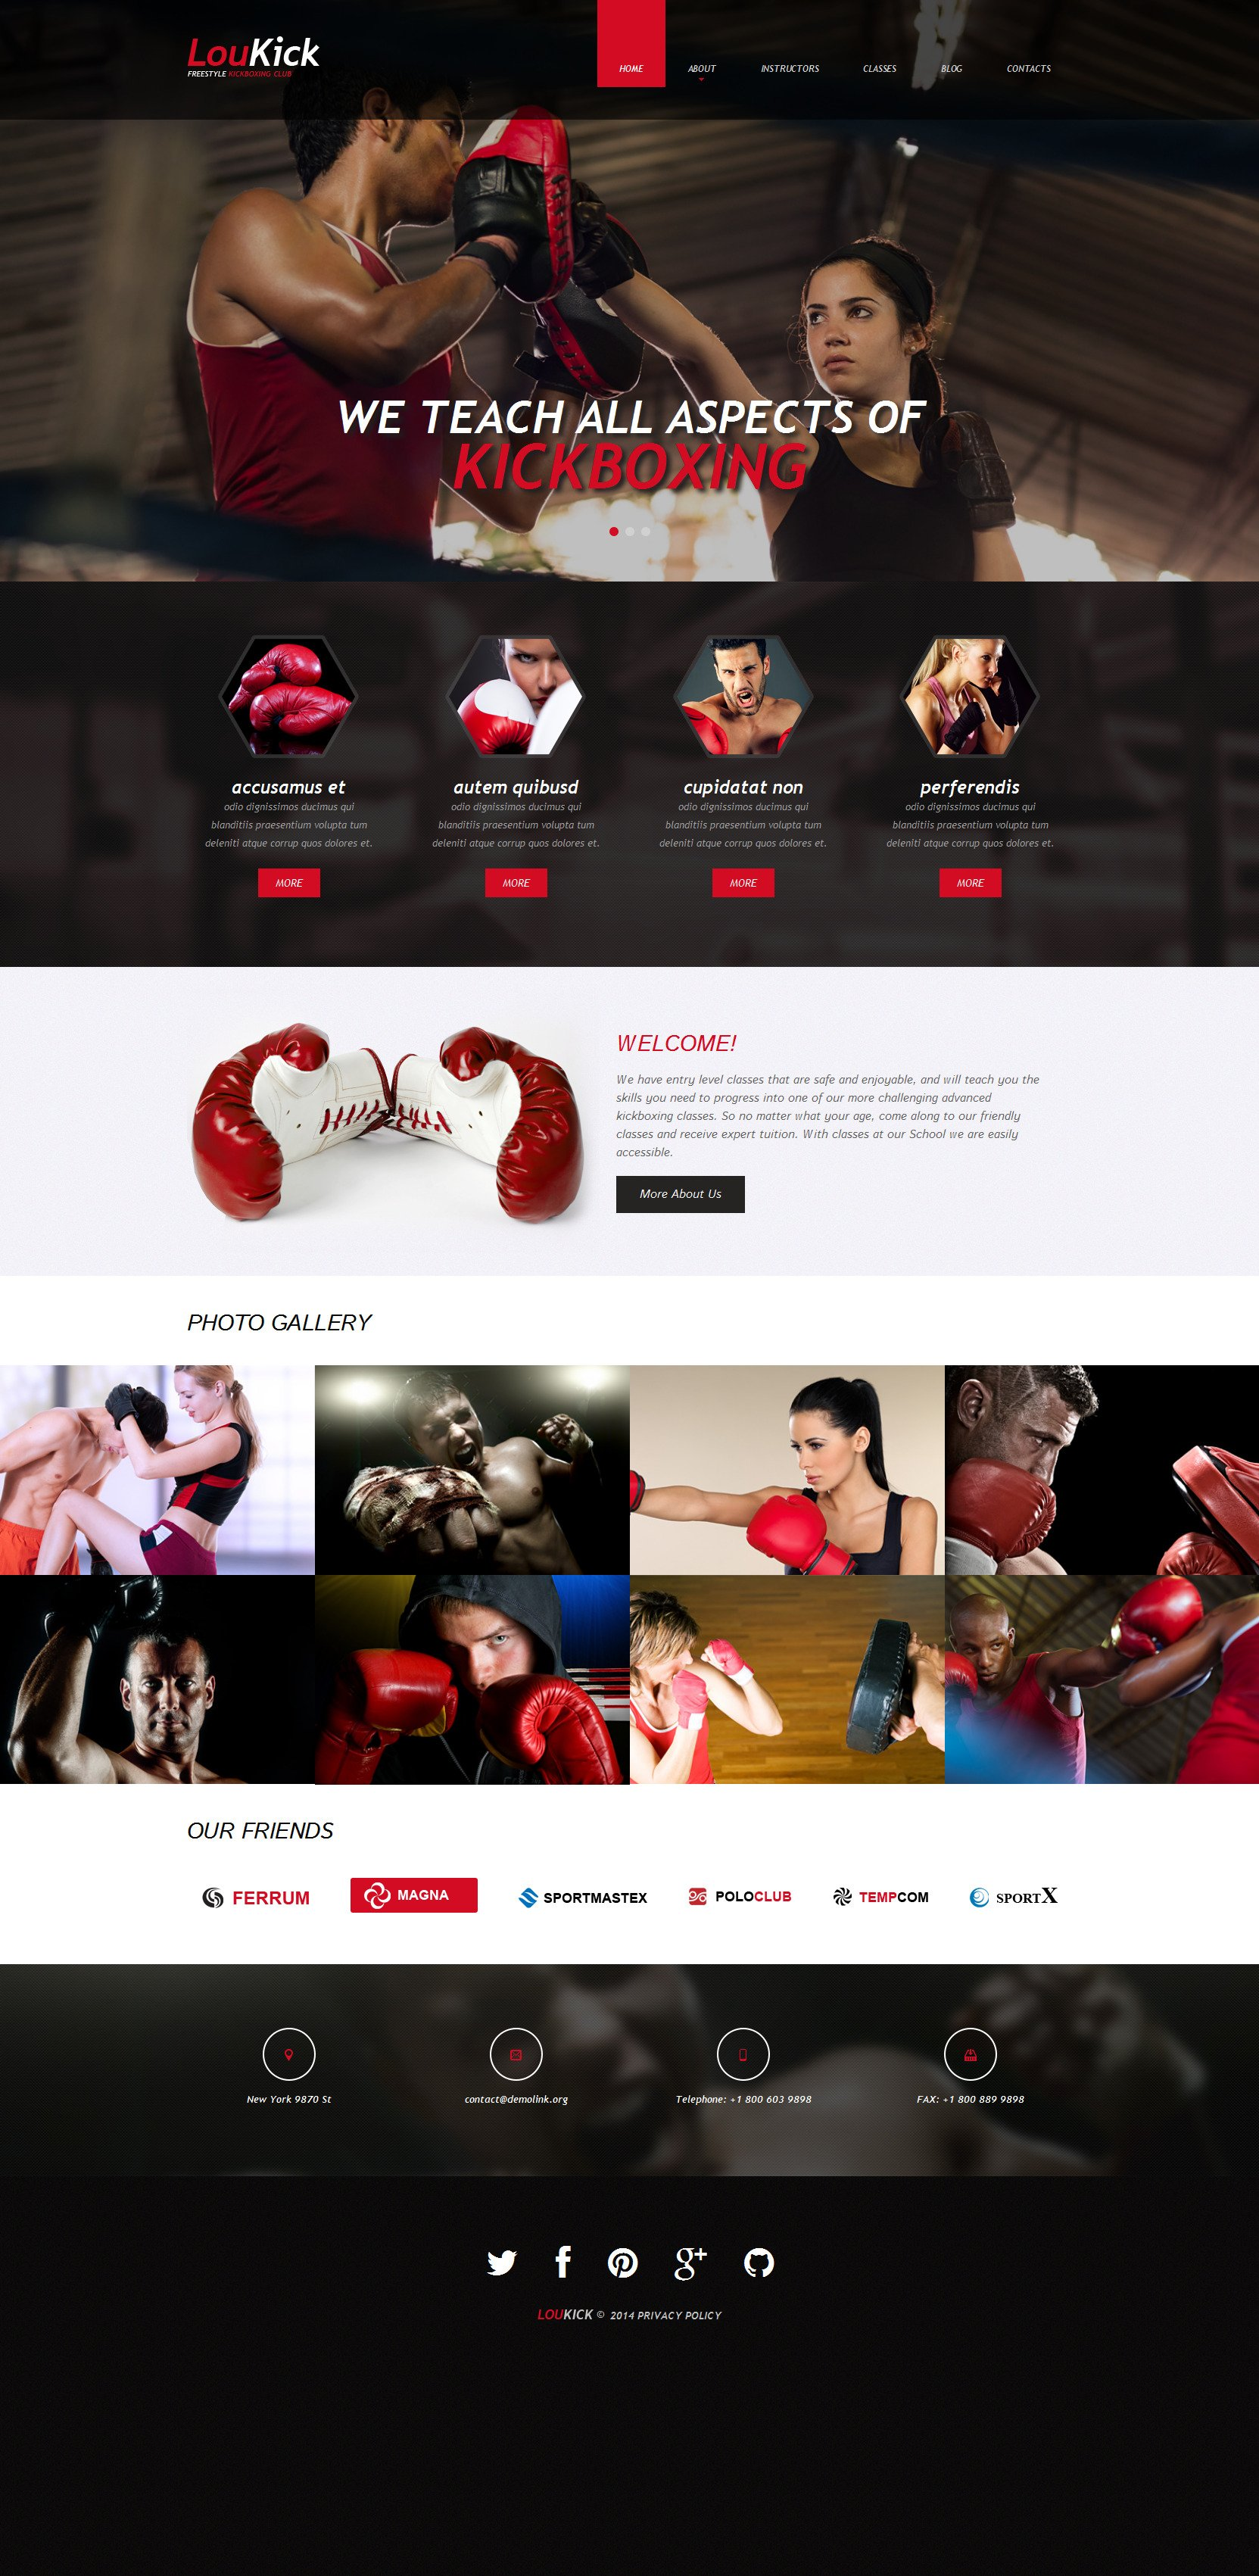 Plantilla Web Responsive para Sitio de Boxeo #49263